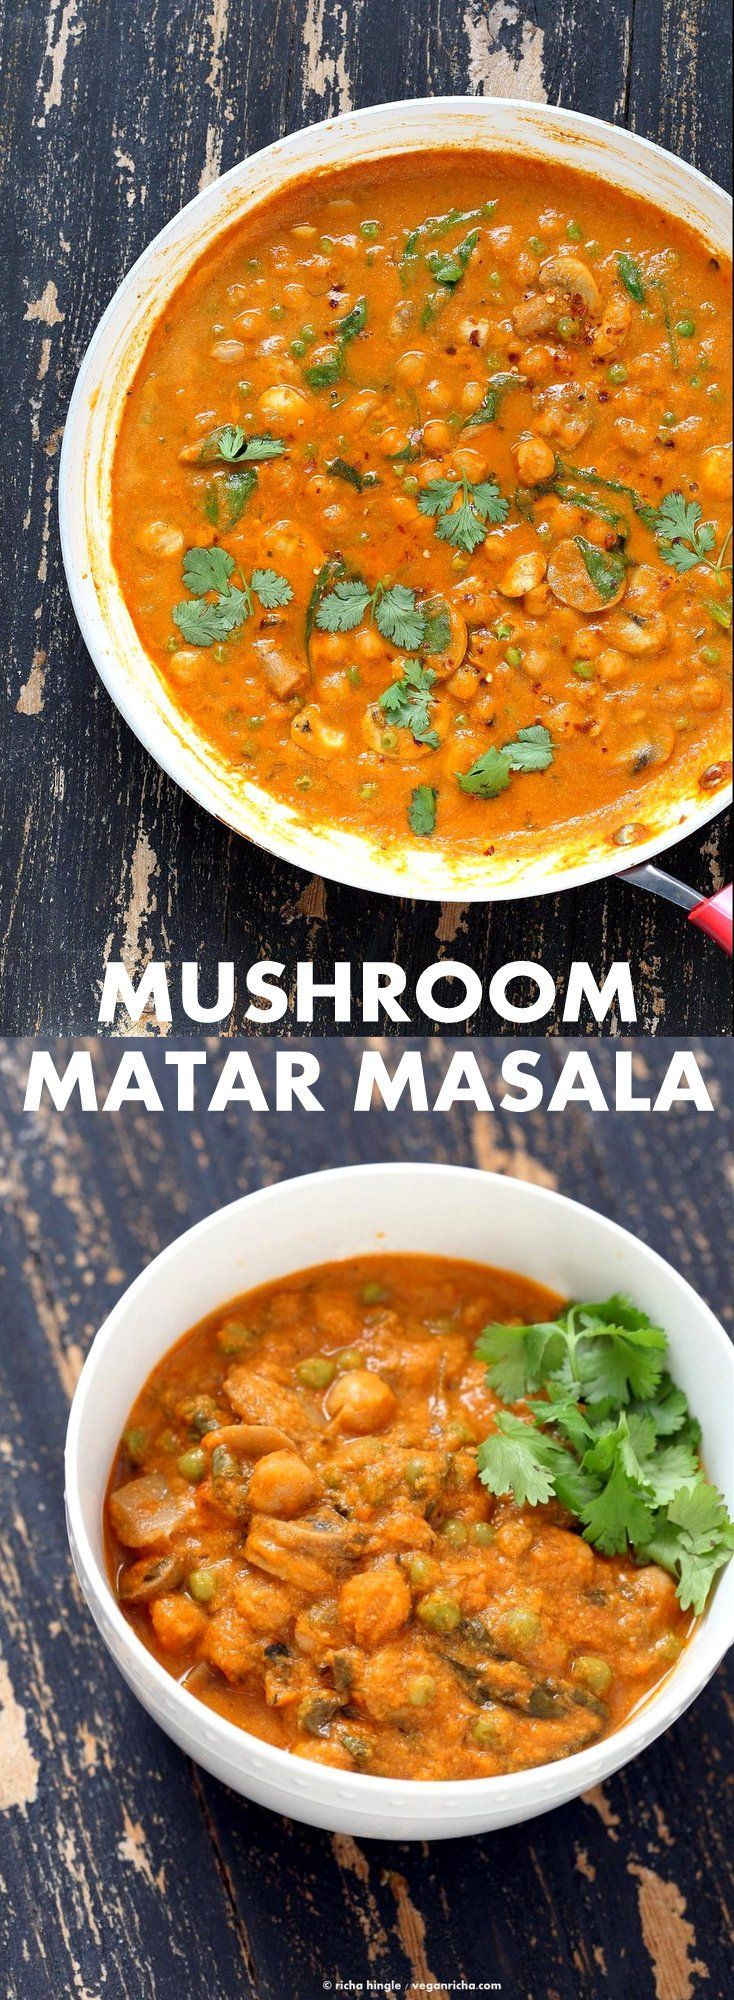 Mushroom Matar Masala. Mushrooms and Peas in creamy tomato sauce. Mushroom Masala Recipe with Easy Masala Sauce , spinach and chickpeas. Vegan Indian Gluten-free Soy-free | http://VeganRicha.com